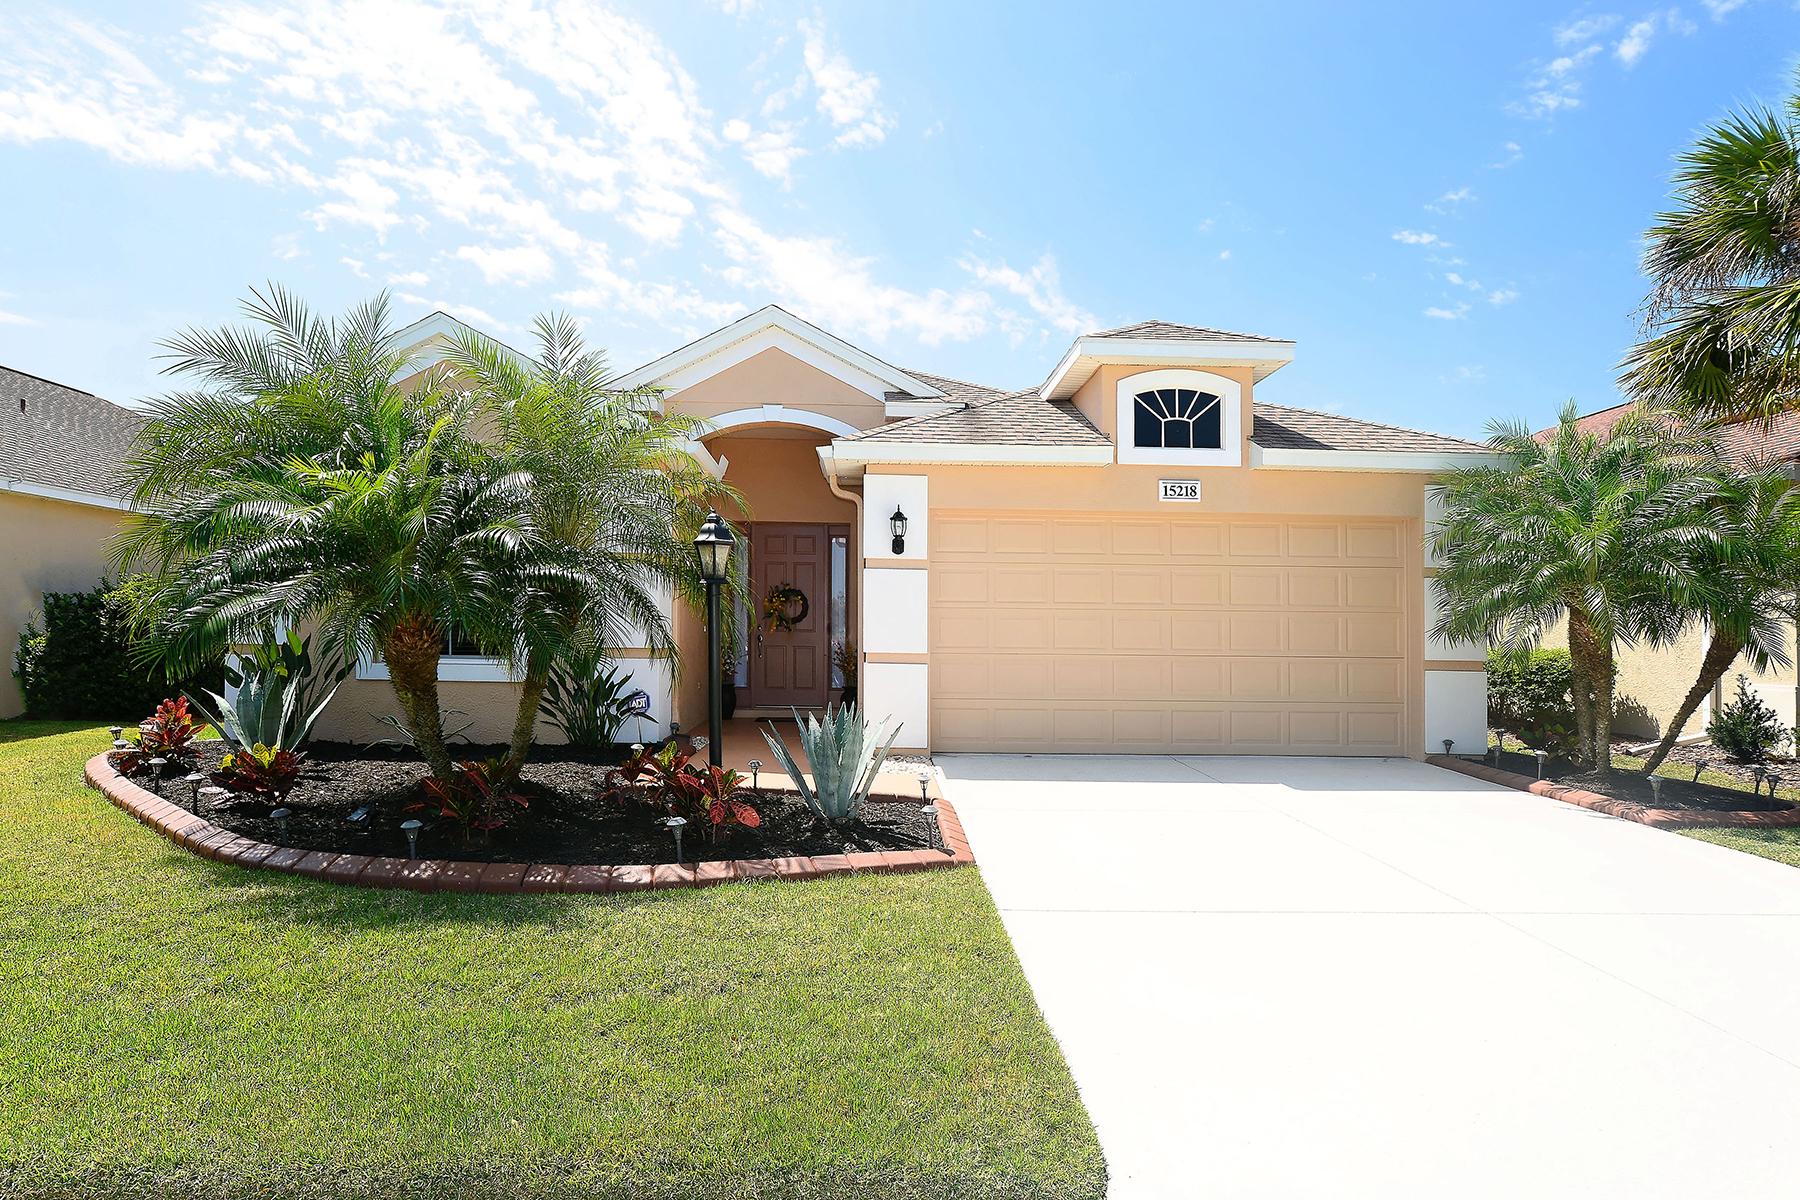 Villa per Vendita alle ore LAKEWOOD RANCH 15218 Blue Fish Cir Lakewood Ranch, Florida, 34202 Stati Uniti